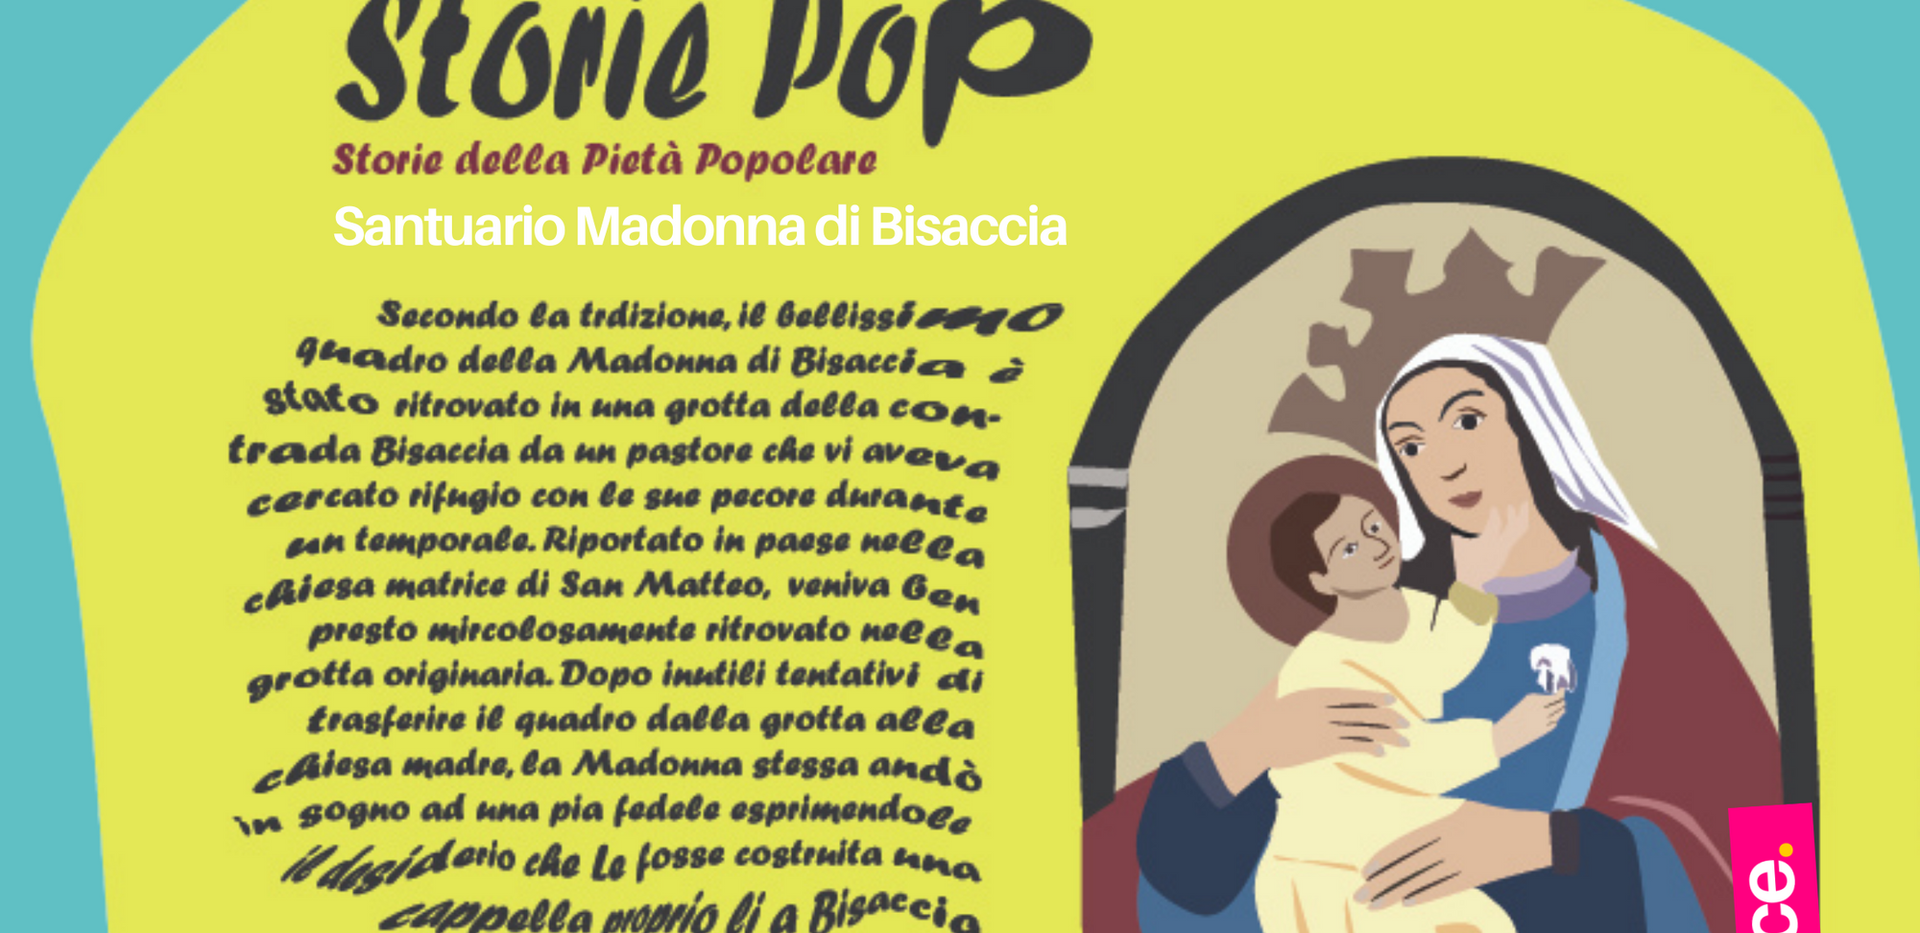 Storie POP Montenero di Bisaccia.png